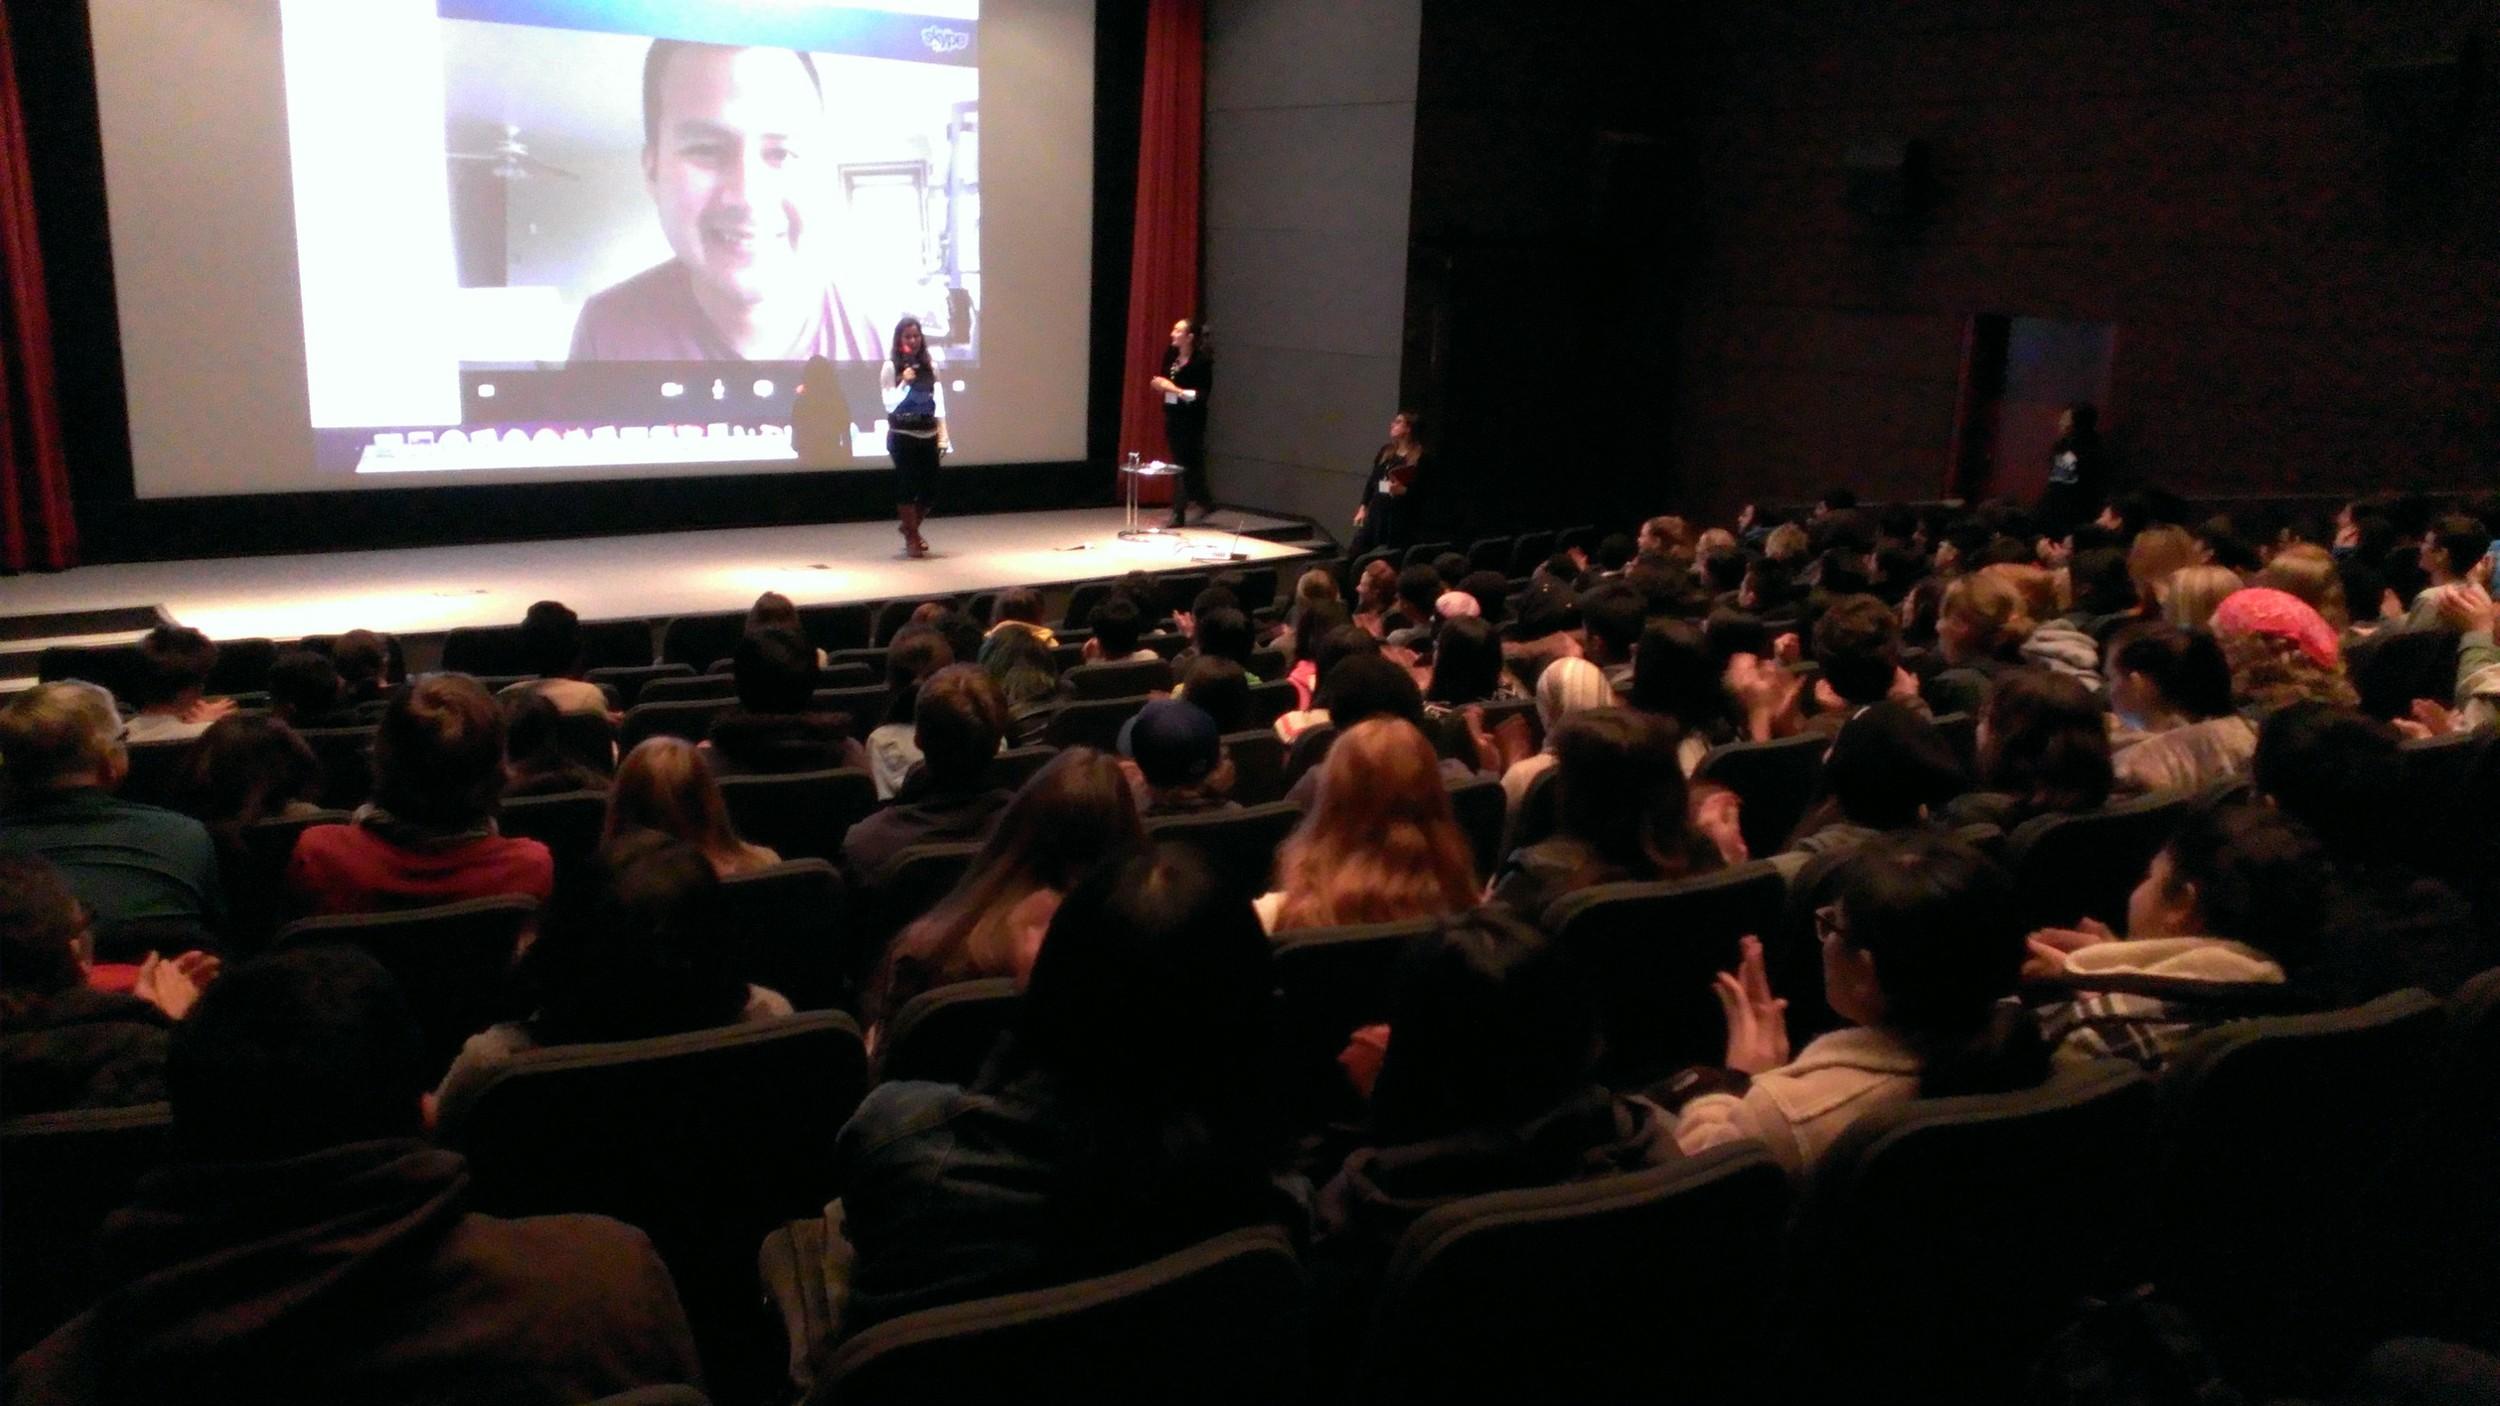 Toronto screening 3 smile and clap.jpg